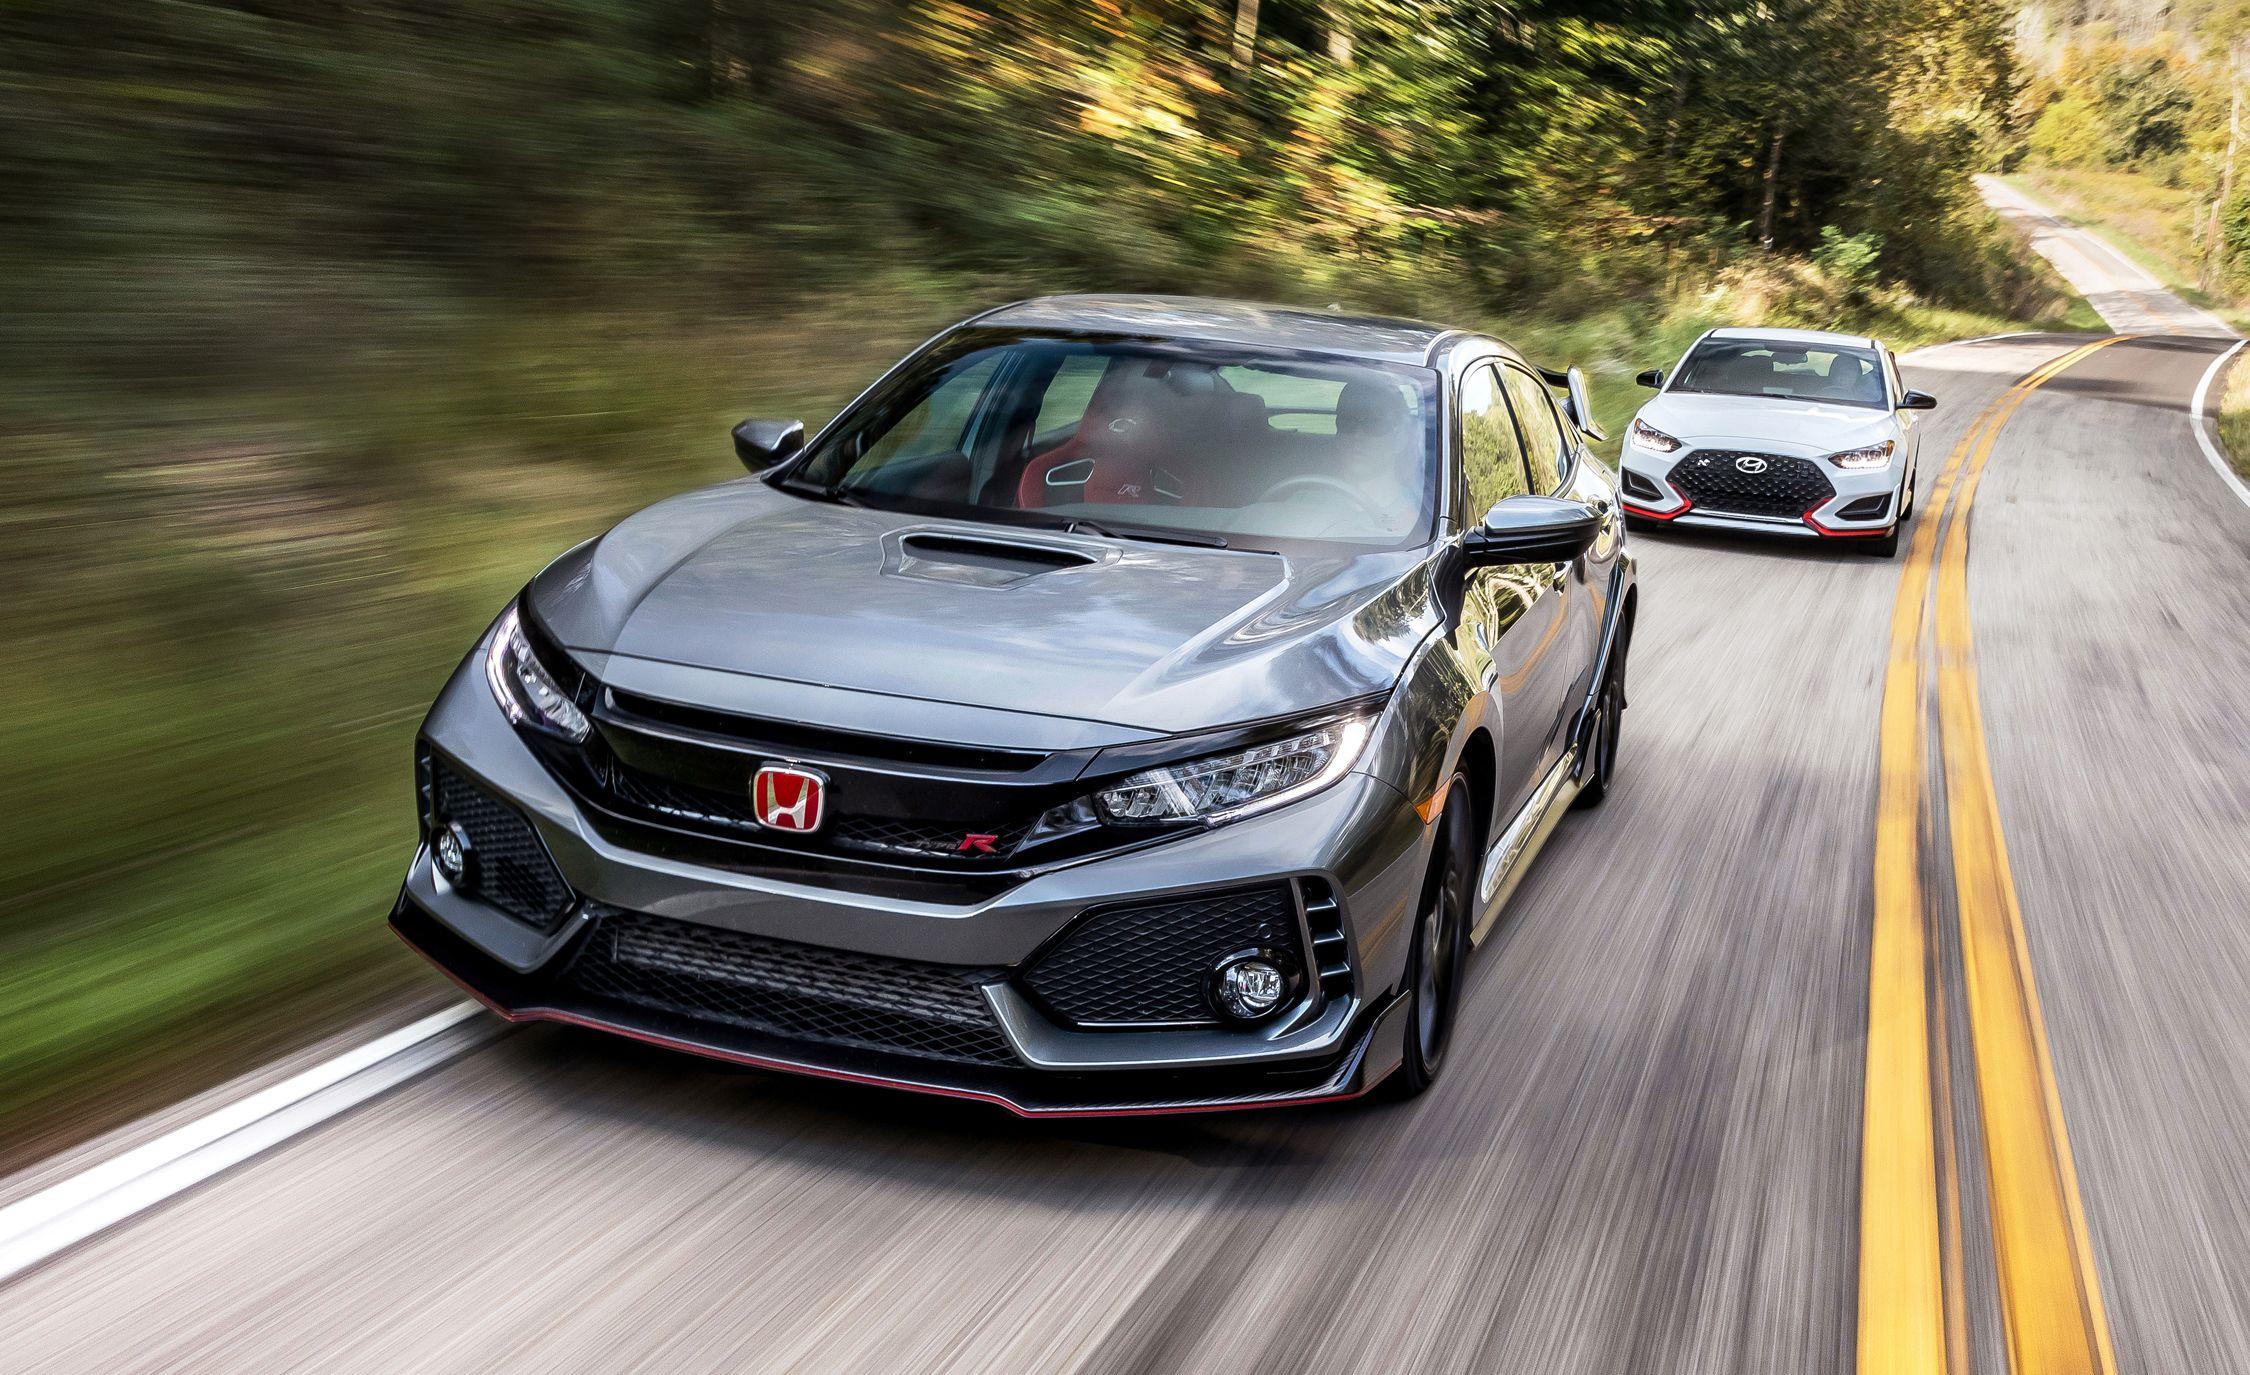 The 2019 Hyundai Veloster N Versus the Honda Civic Type R